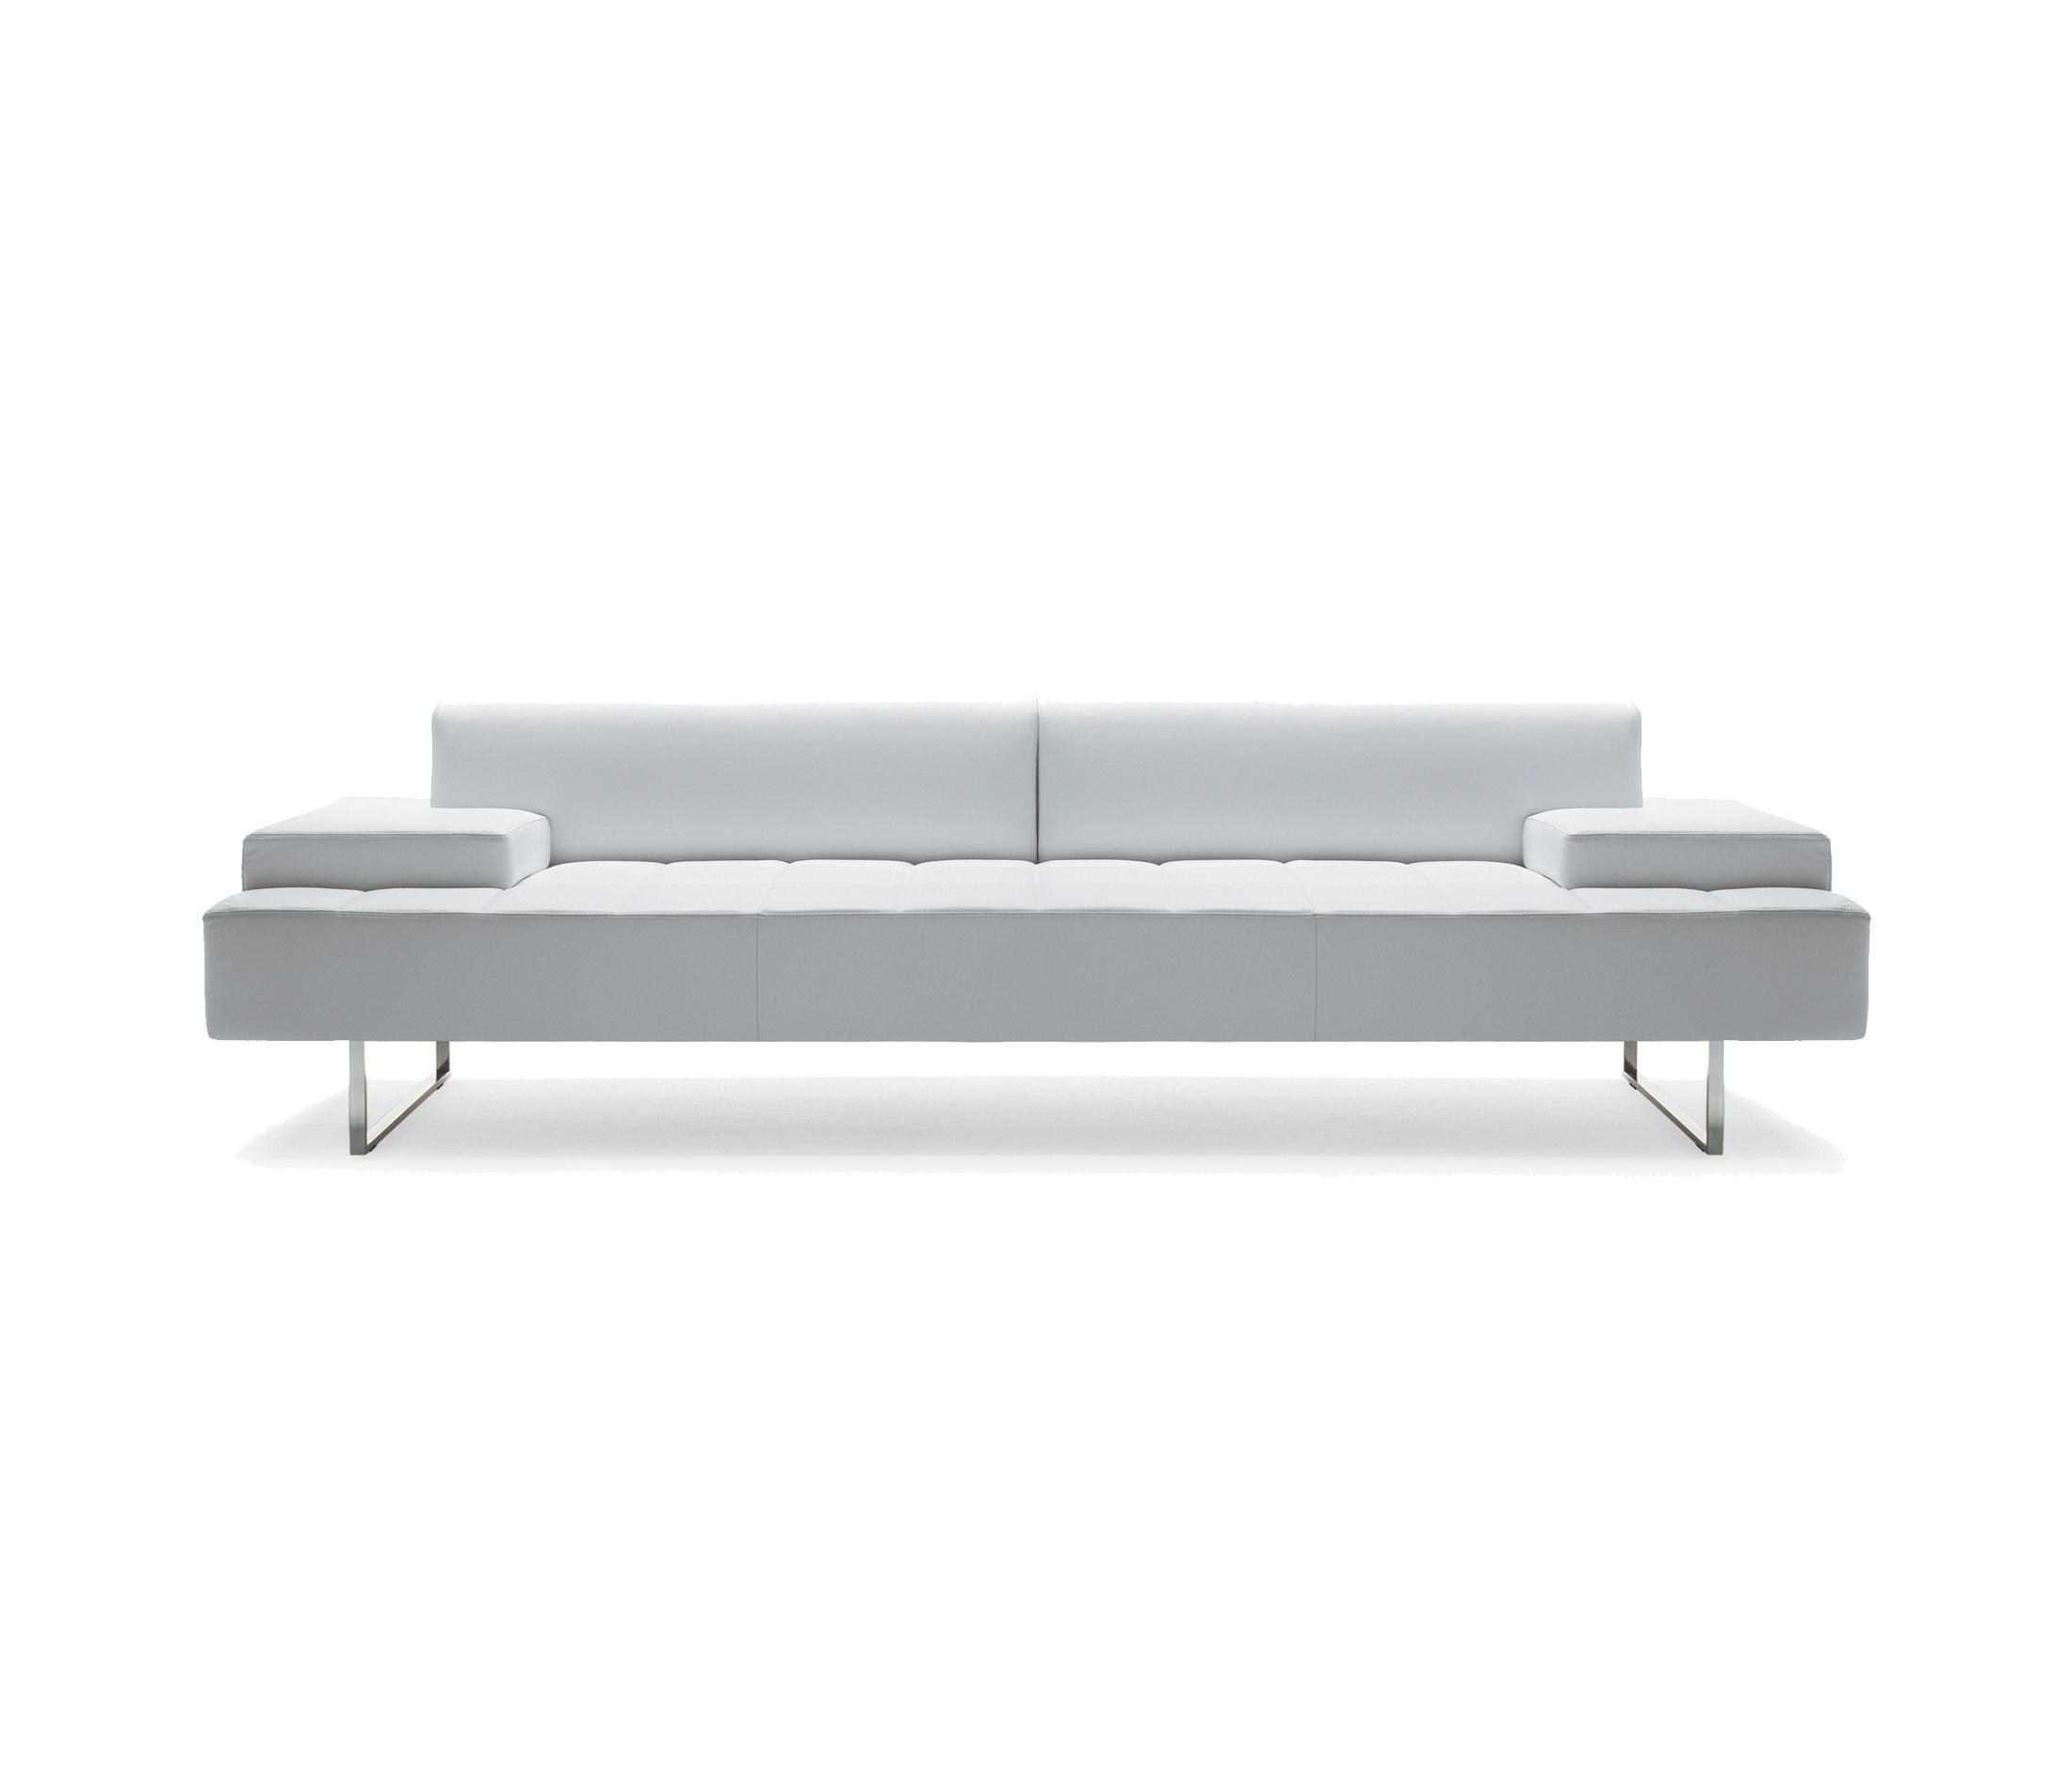 QUADRA - Sofas von Poltrona Frau | Architonic